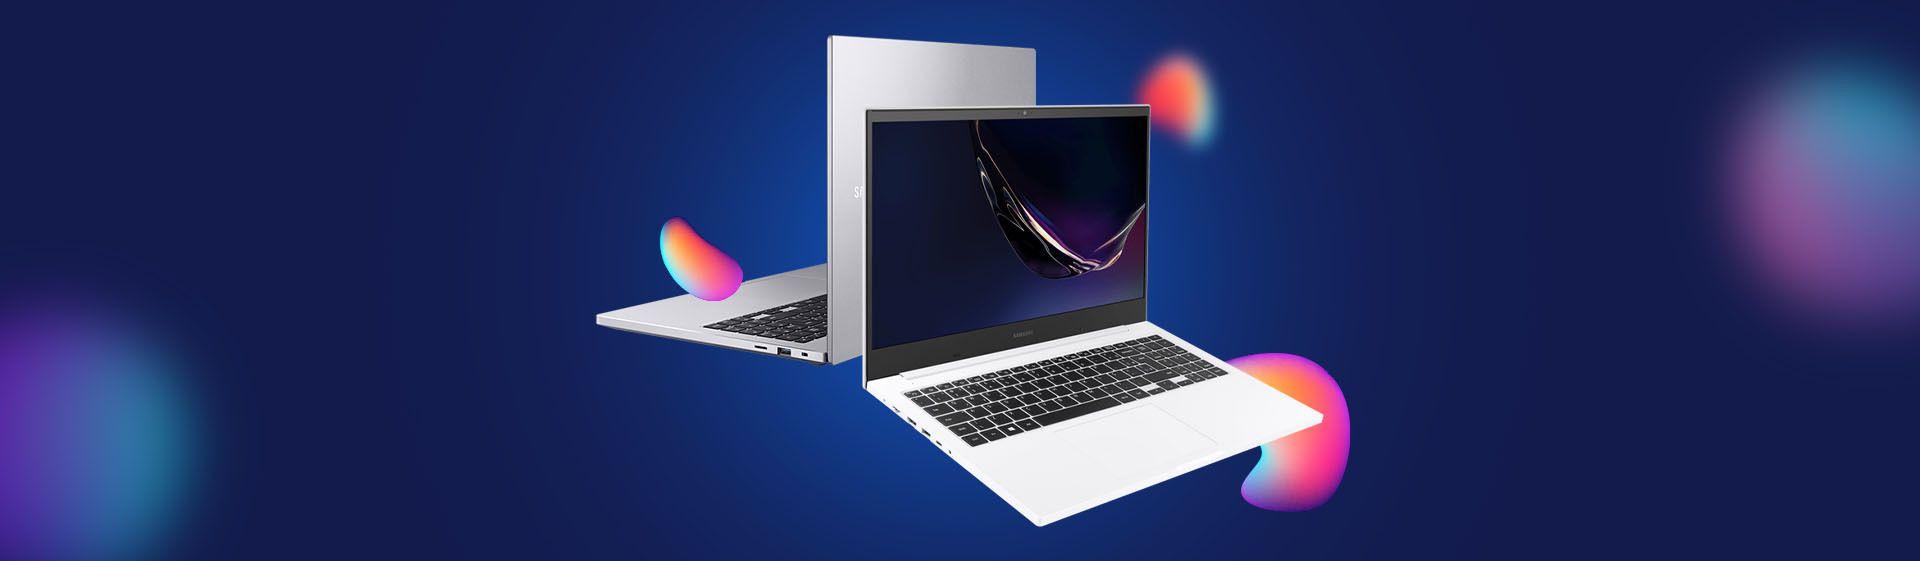 Samsung Book X30: o notebook vale a pena? Veja análise